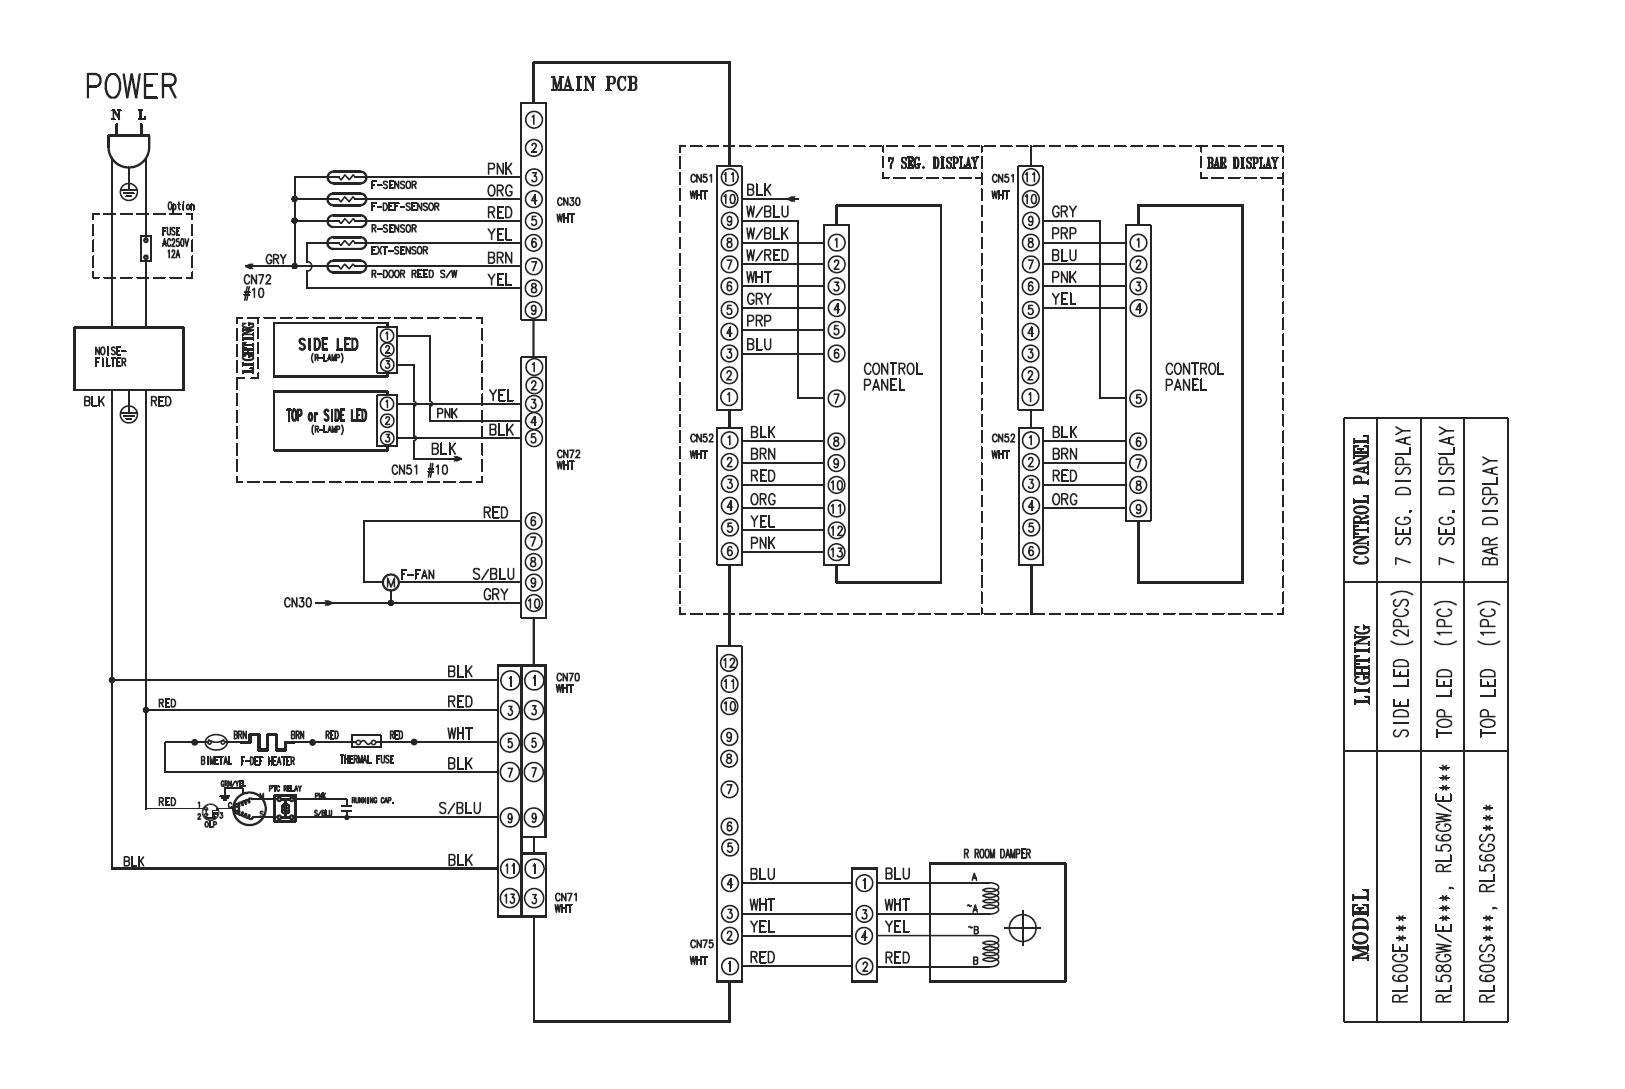 Diagrama De Refri Samsung Yoreparo $ Apktodownload.com